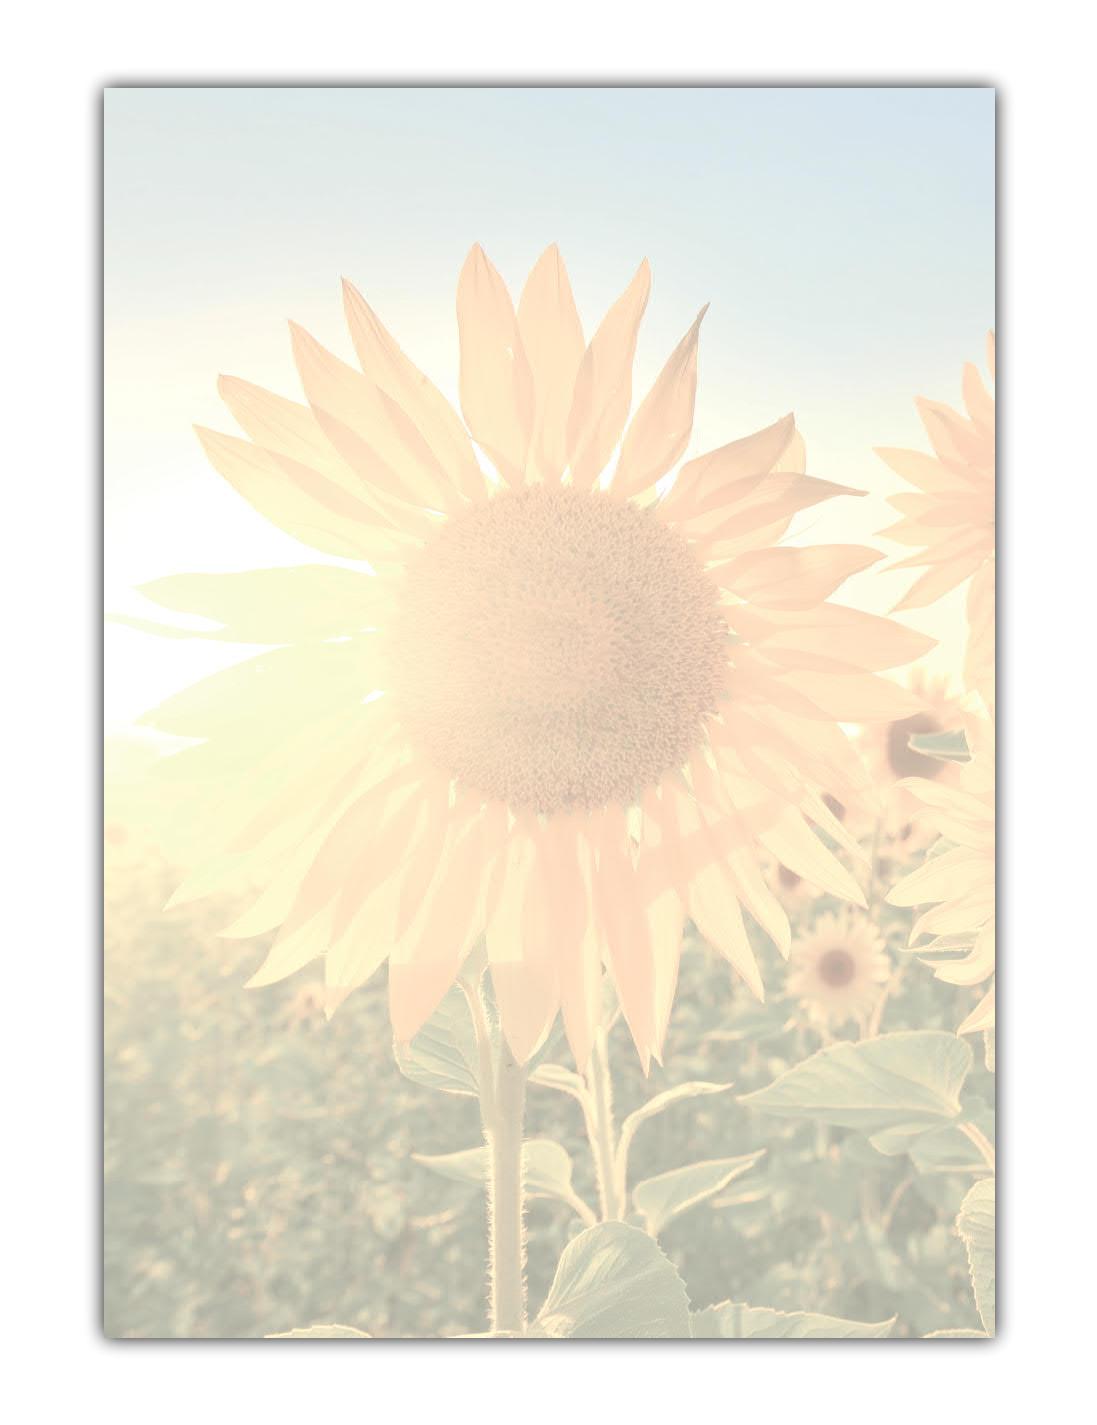 Motivpapier Briefpapier Sonnenblumen im Sonnenlicht (MPA-5199, DIN A4, 100 Blatt)